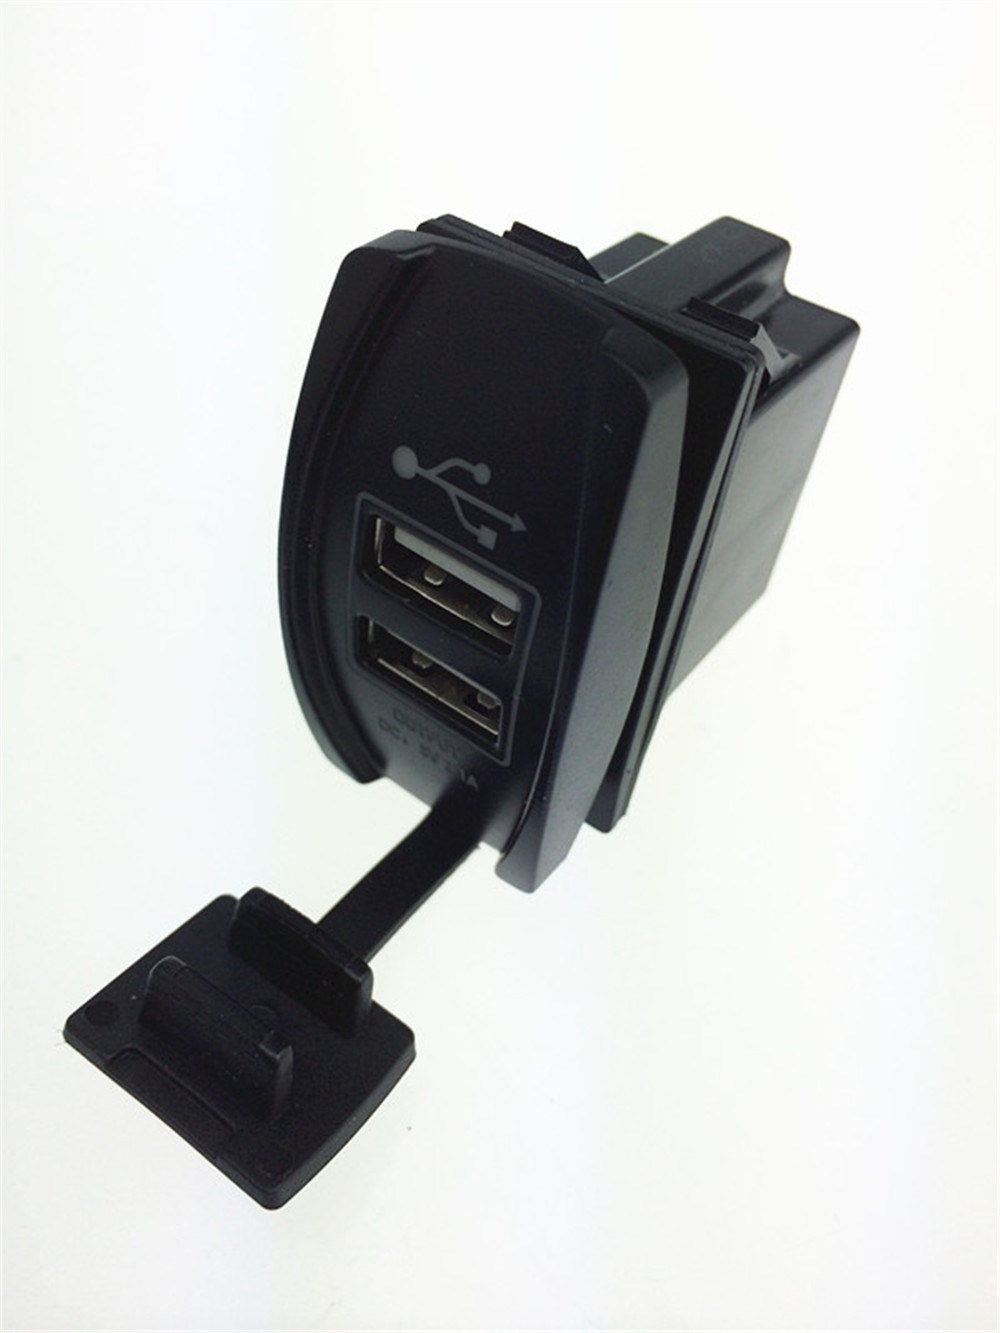 Car Marine Universal Cigarette Lighter Plug Socket Adaptor